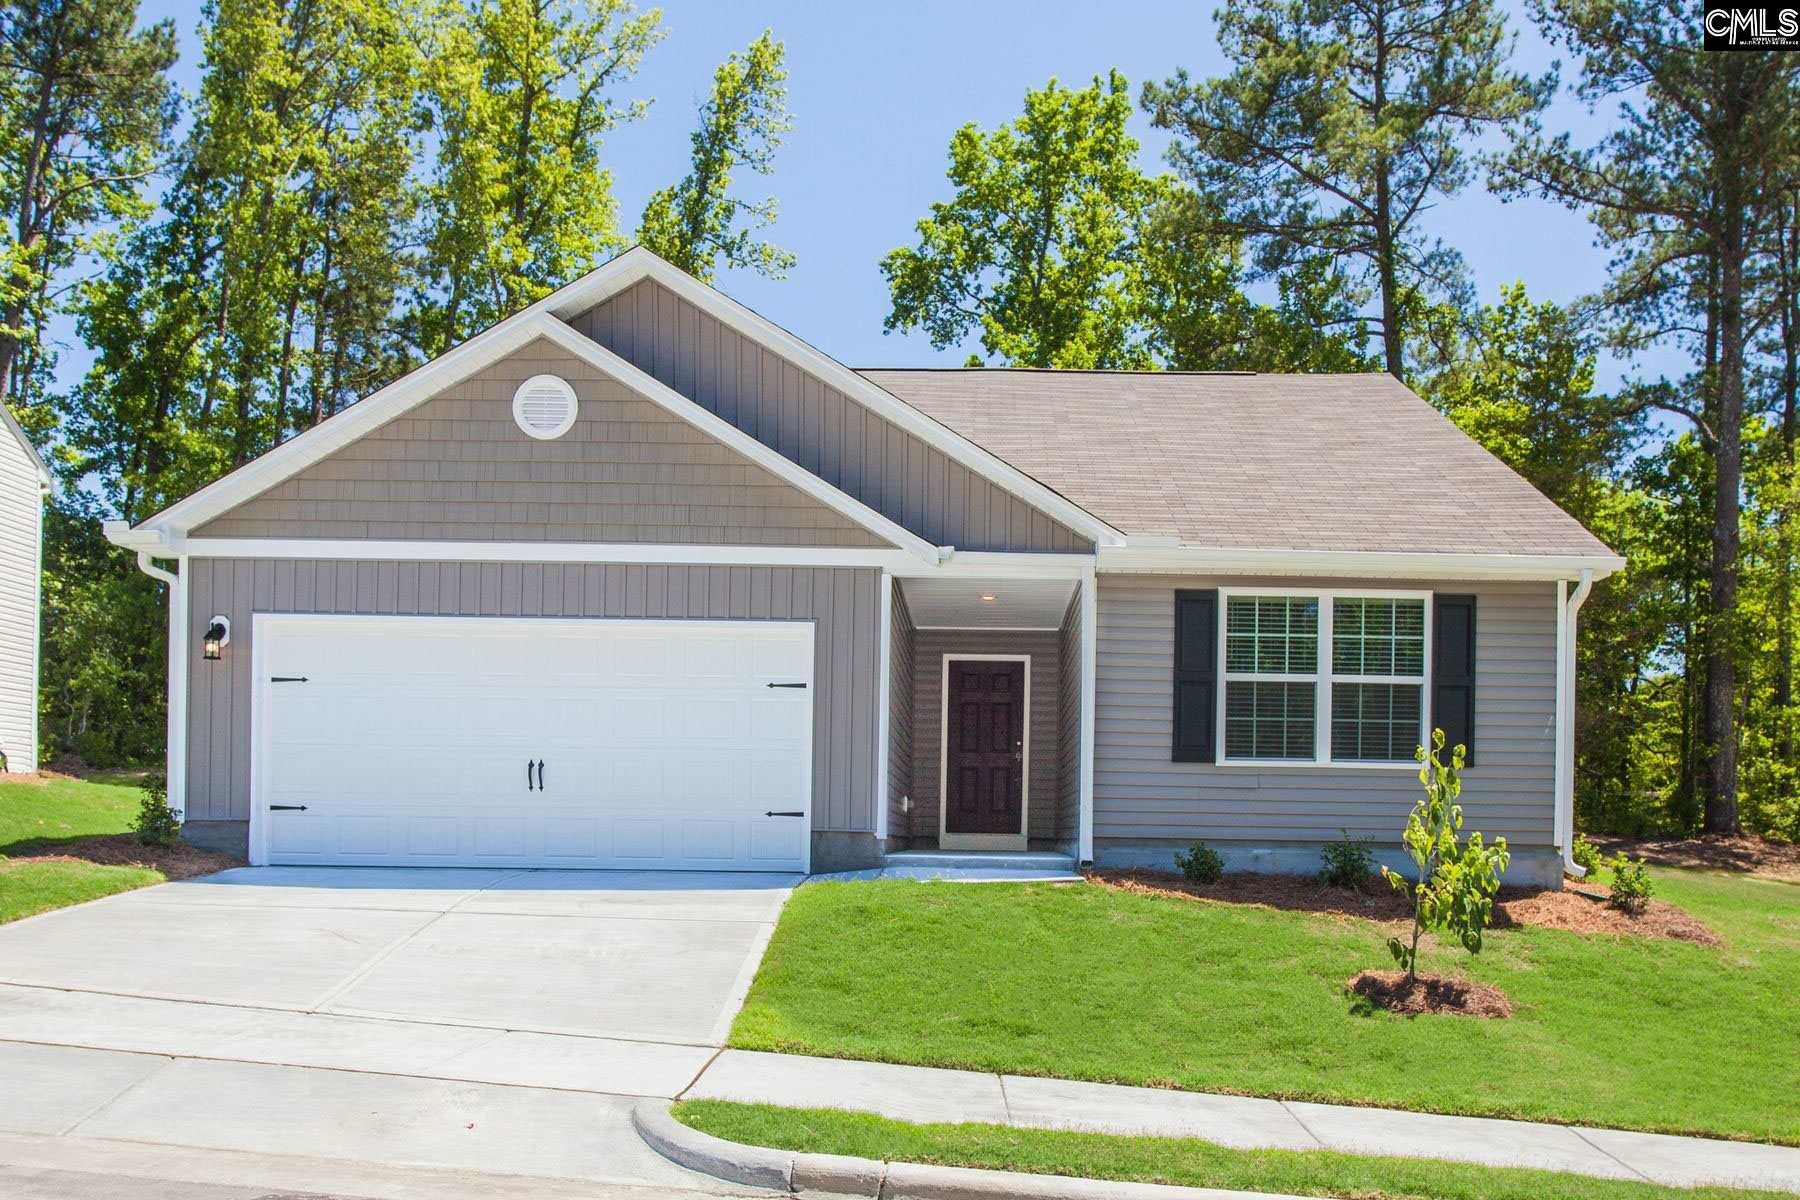 243 Common Reed Gilbert, SC 29054